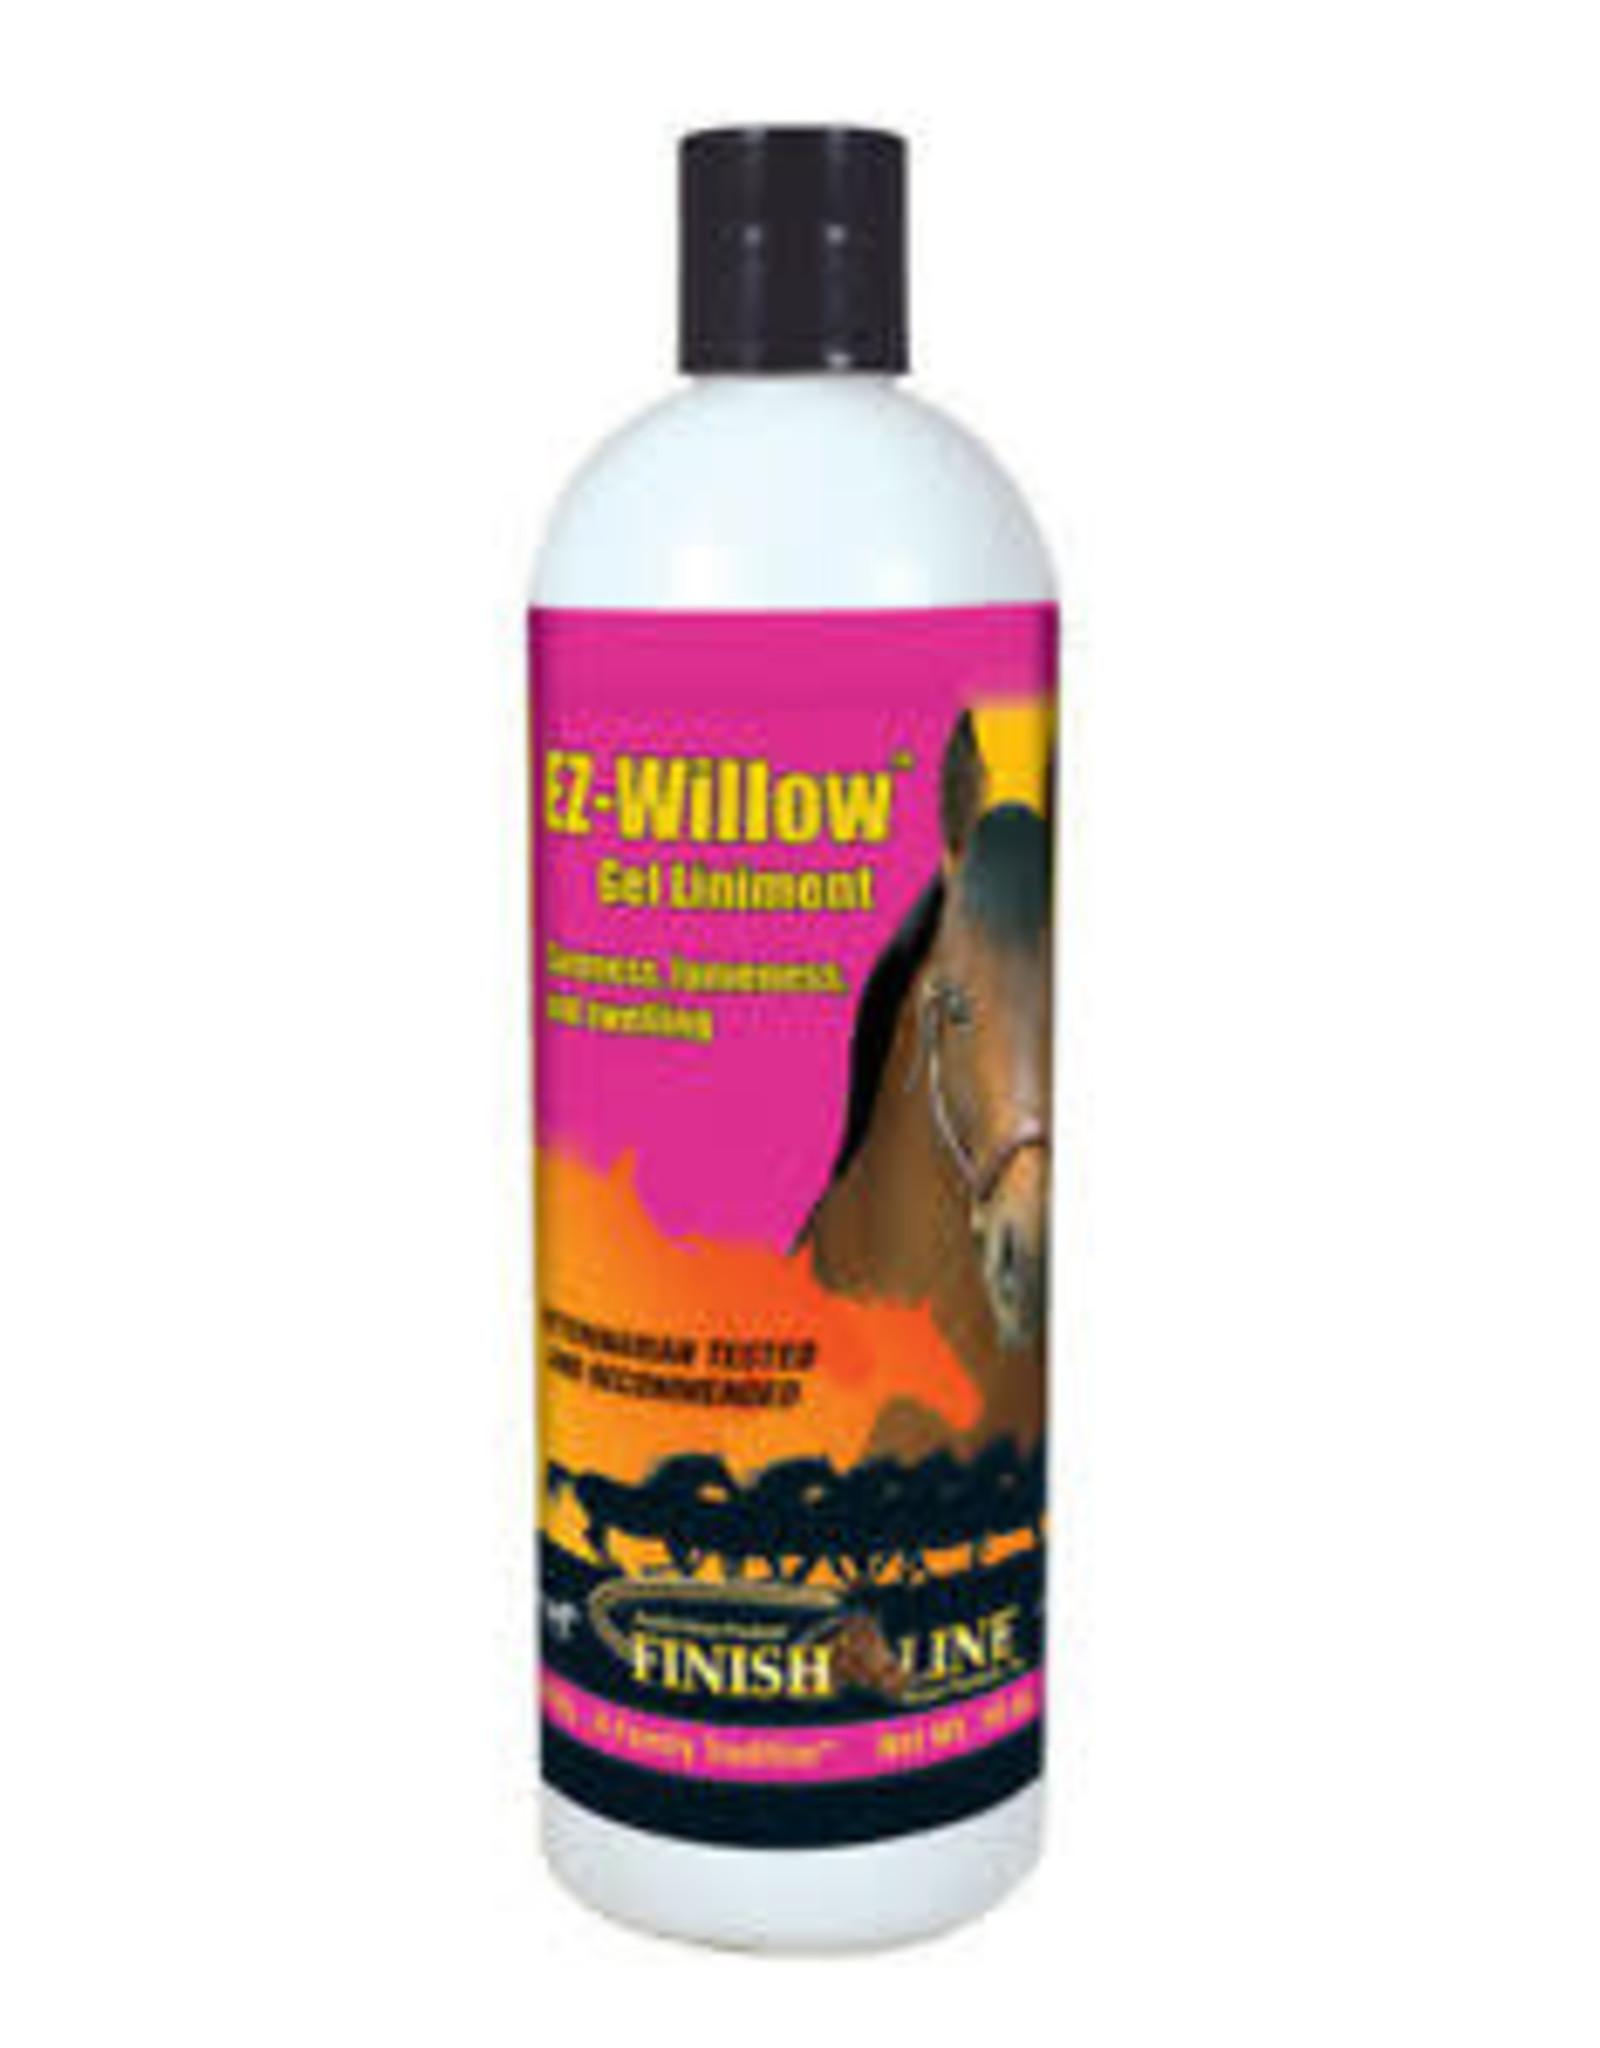 FINISHLINE Finish Line EZ- Willow Gel Lin 16oz